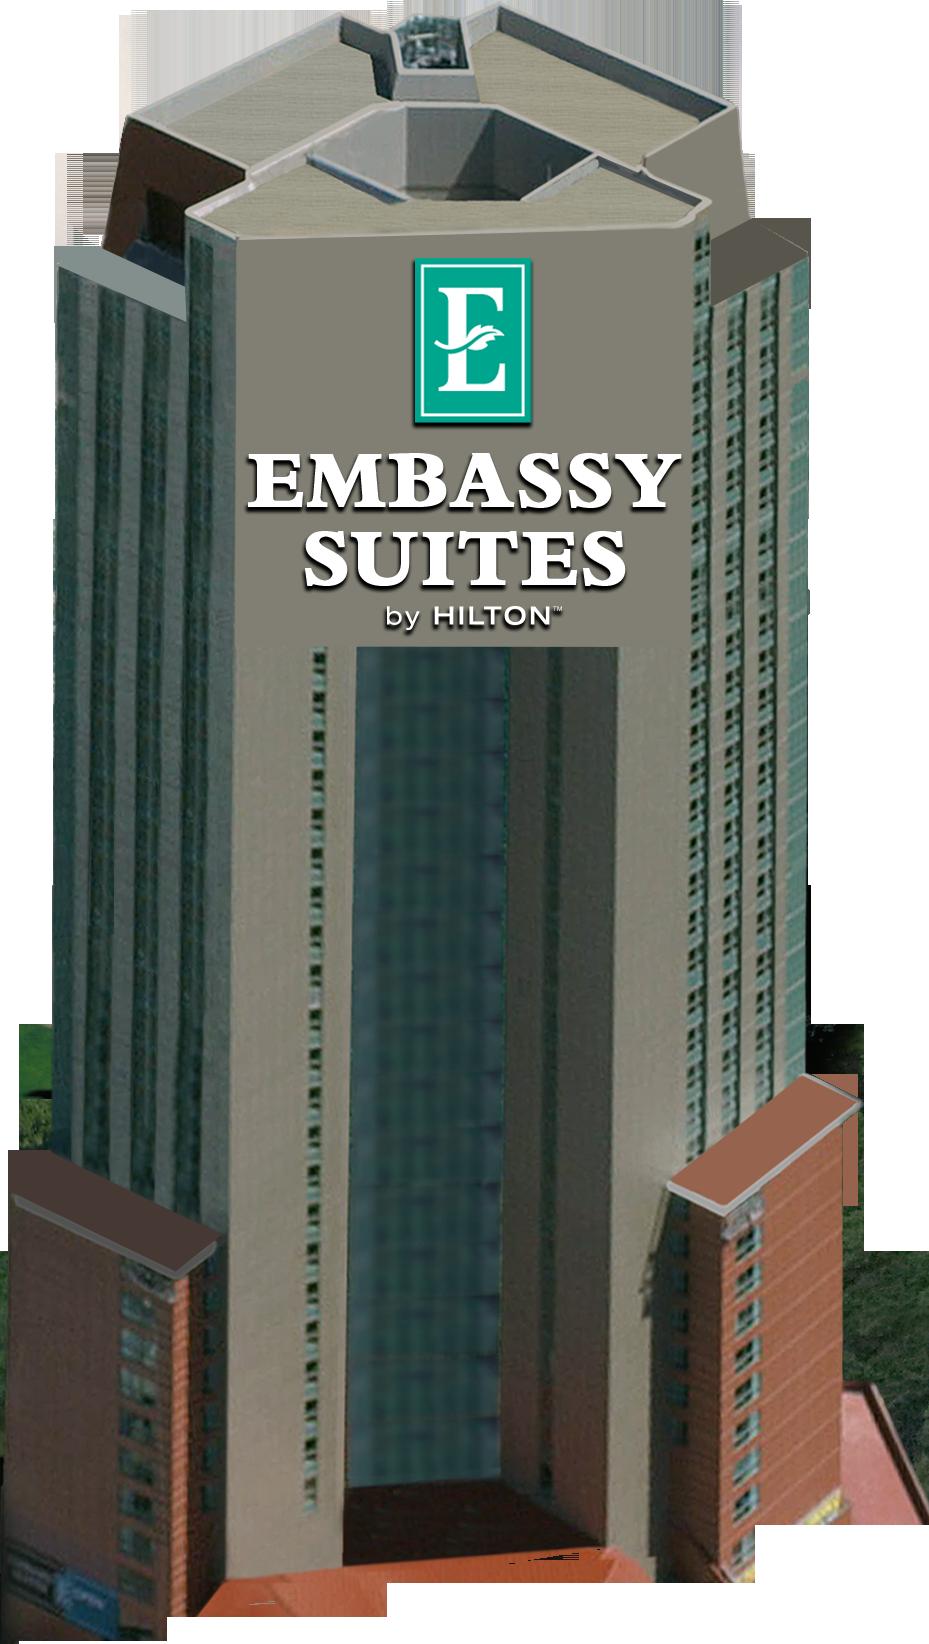 Niagara Hilton Hotel Deals